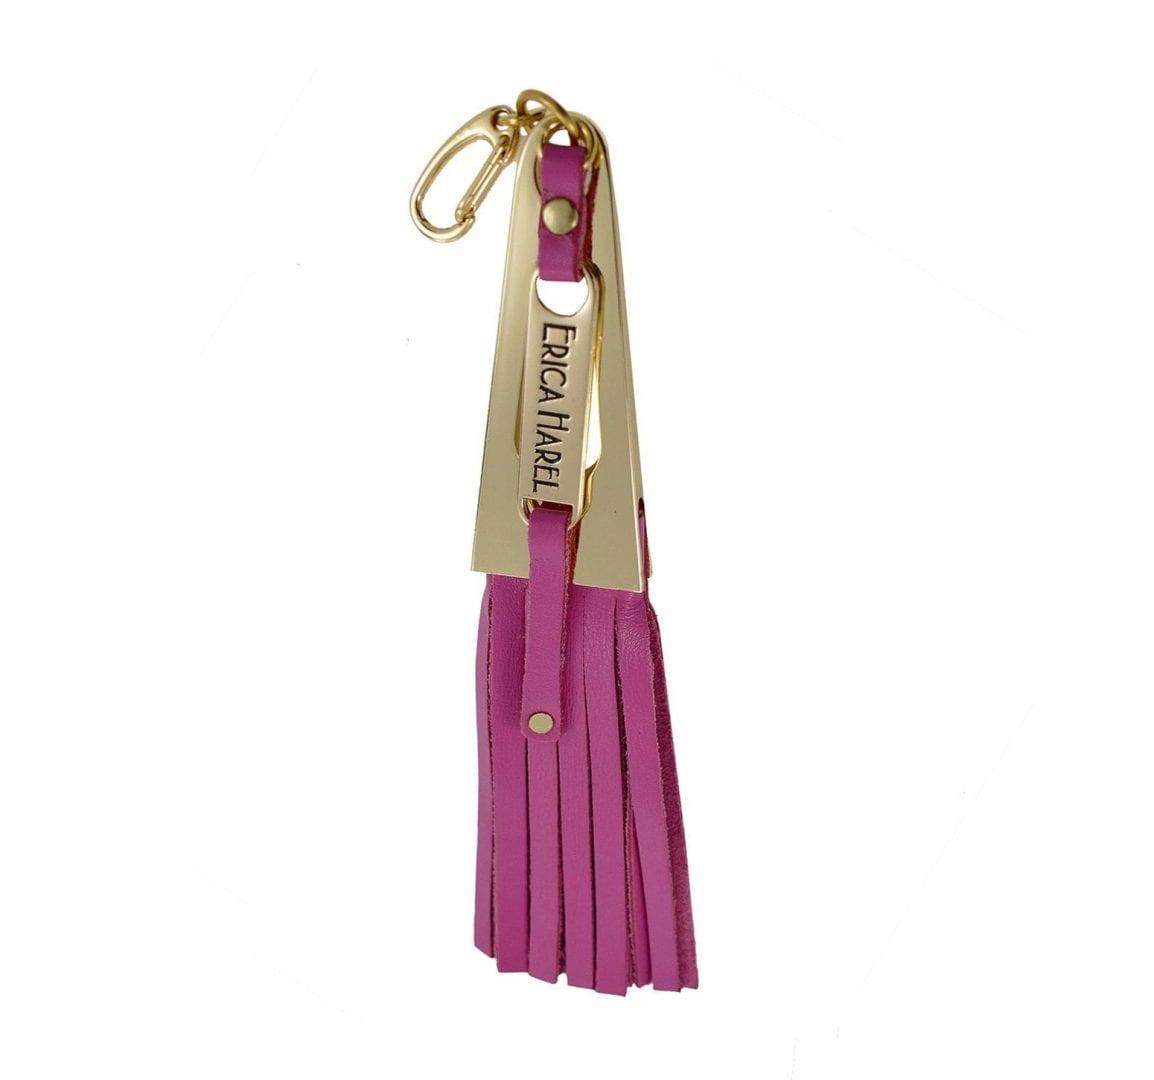 pink leather tassel purse charm